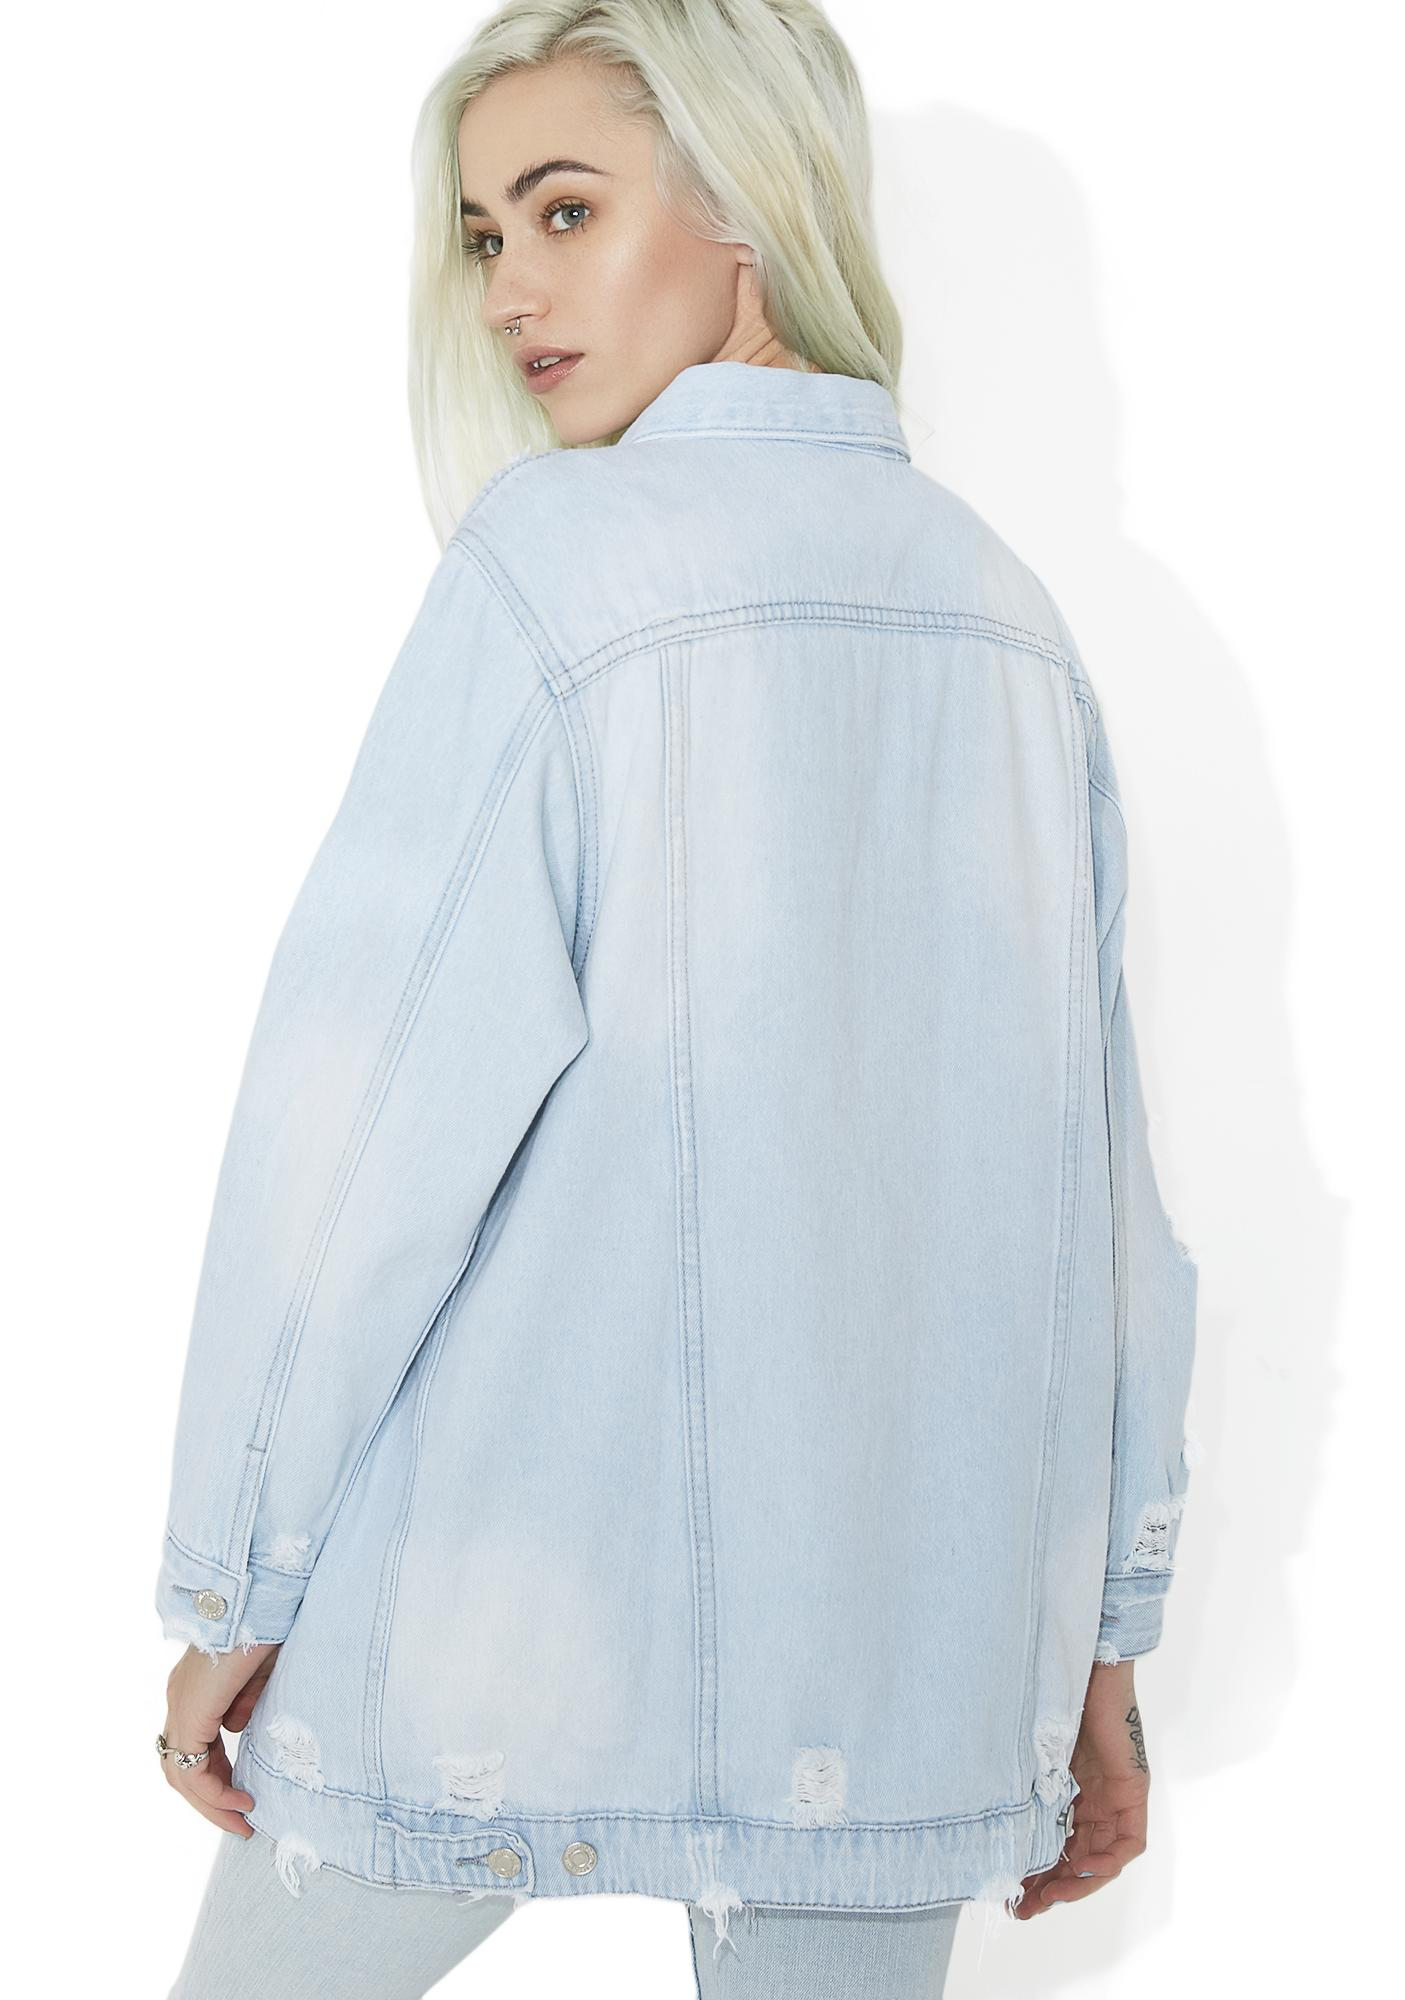 Livin' On A Prayer Denim Jacket